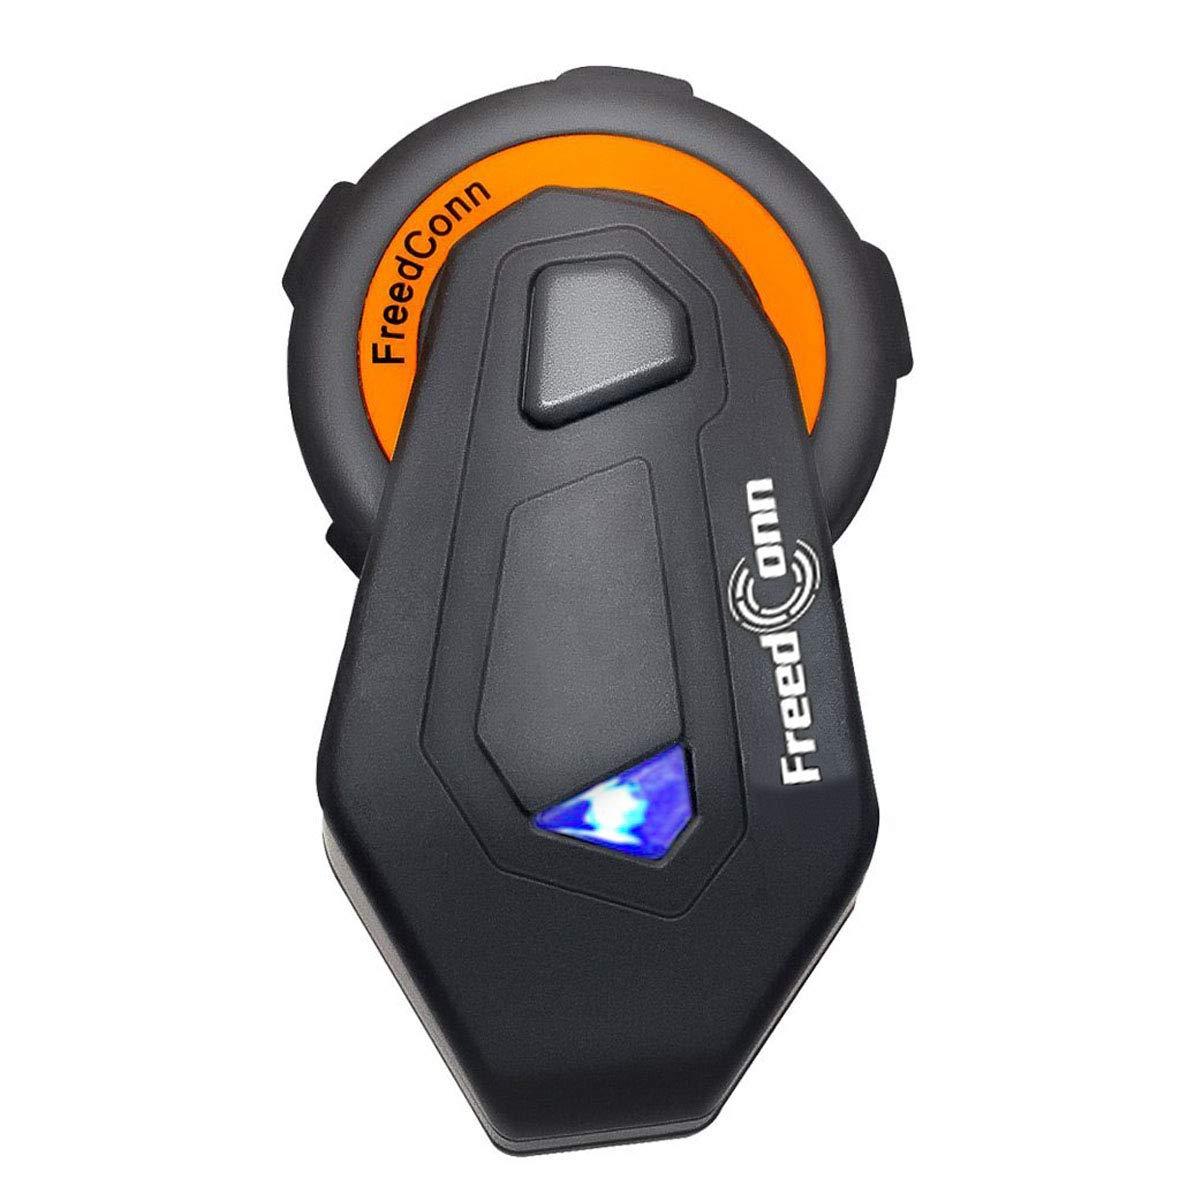 FreedConn T-MAX Motorcycle Helmet Intercom Bluetooth 4.1 Headsets, Full Duplex 6 Riders Group Helmet Intercom, Range 1000m, IPX65 Waterproof, Voice Prompt, Stereo Music, FM Radio, GPS (1 Pack)